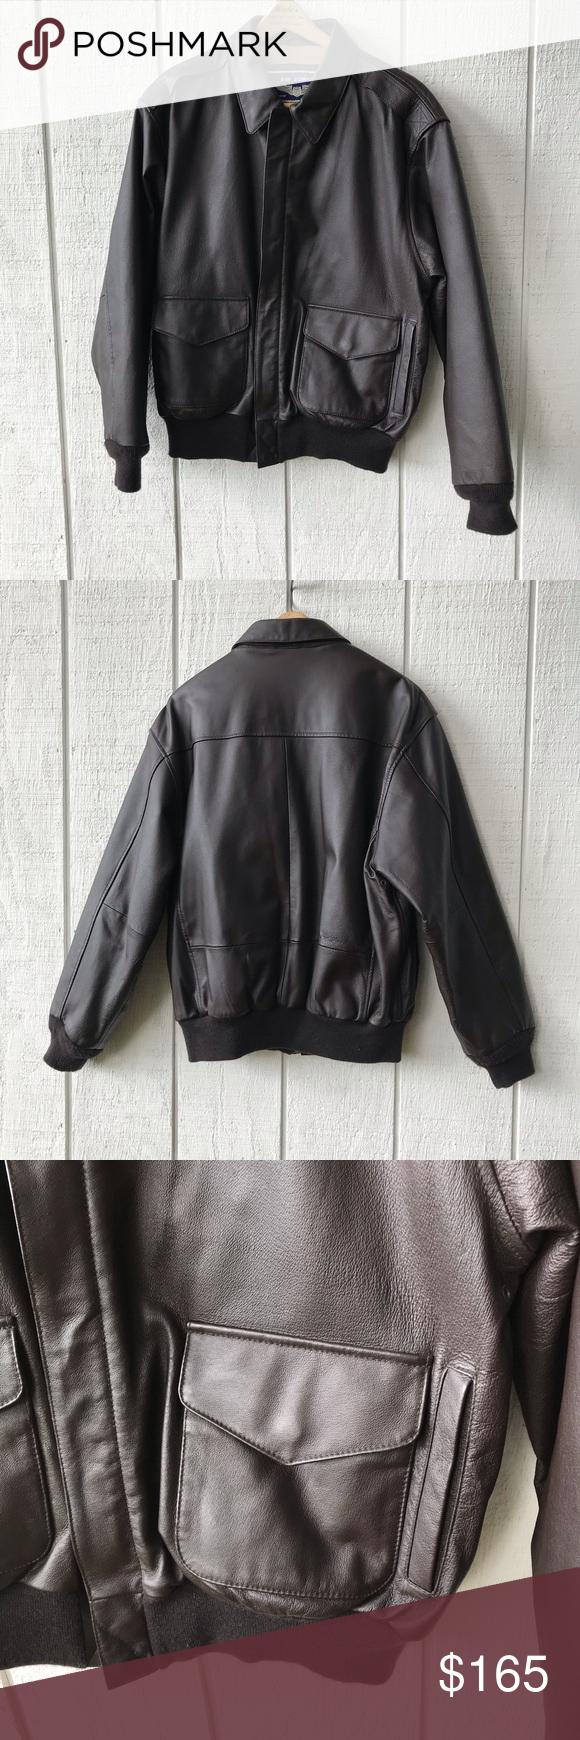 Sale Air Force Airborne Leather Jacket M Leather Jacket 1940s Fashion Fashion [ 1740 x 580 Pixel ]